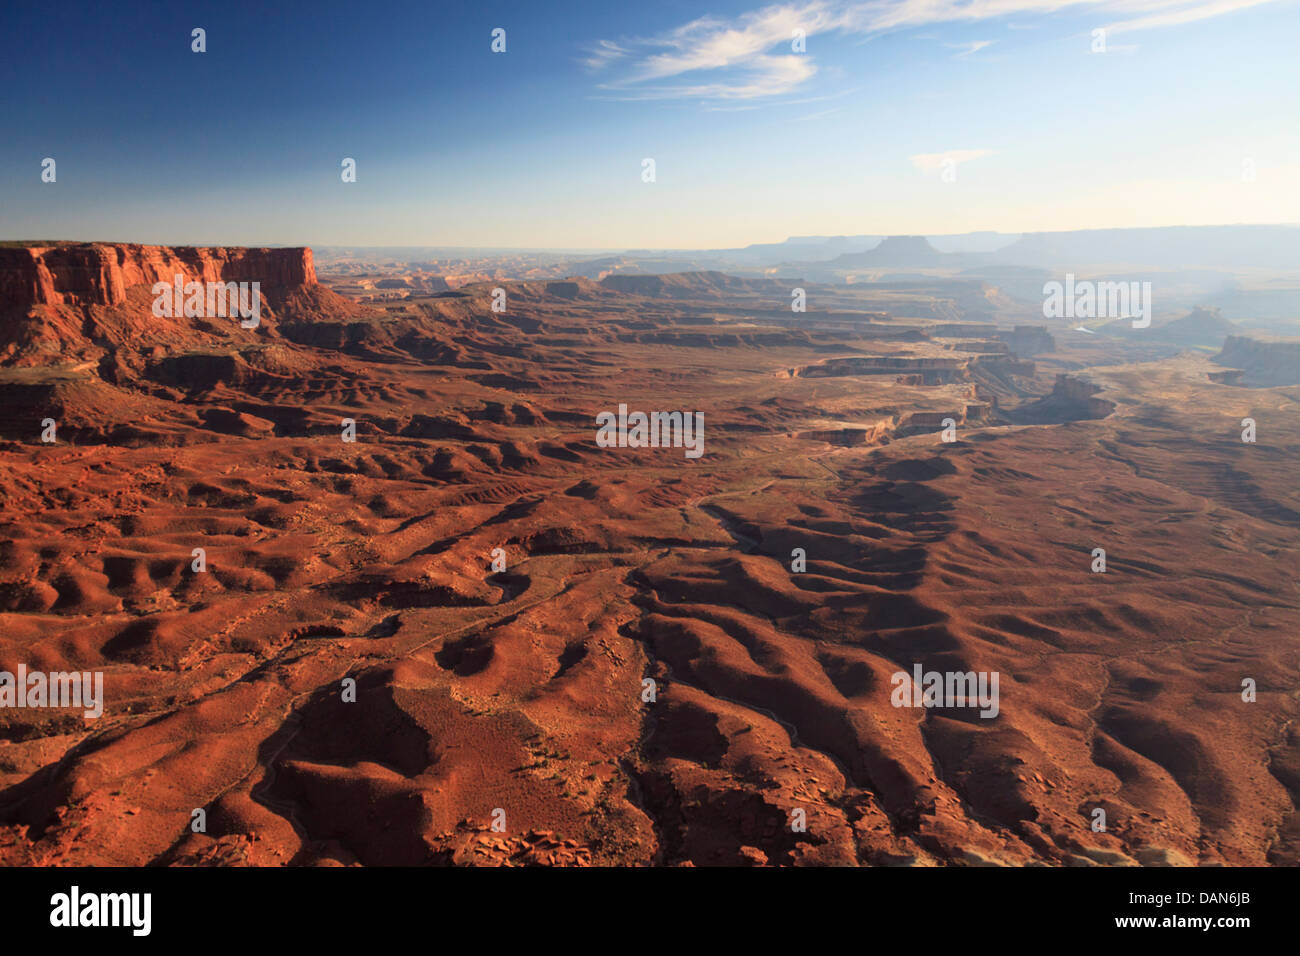 USA, Utah, Canyonlands National Park, Insel im Stadtteil Himmel, Grand View Point Stockbild